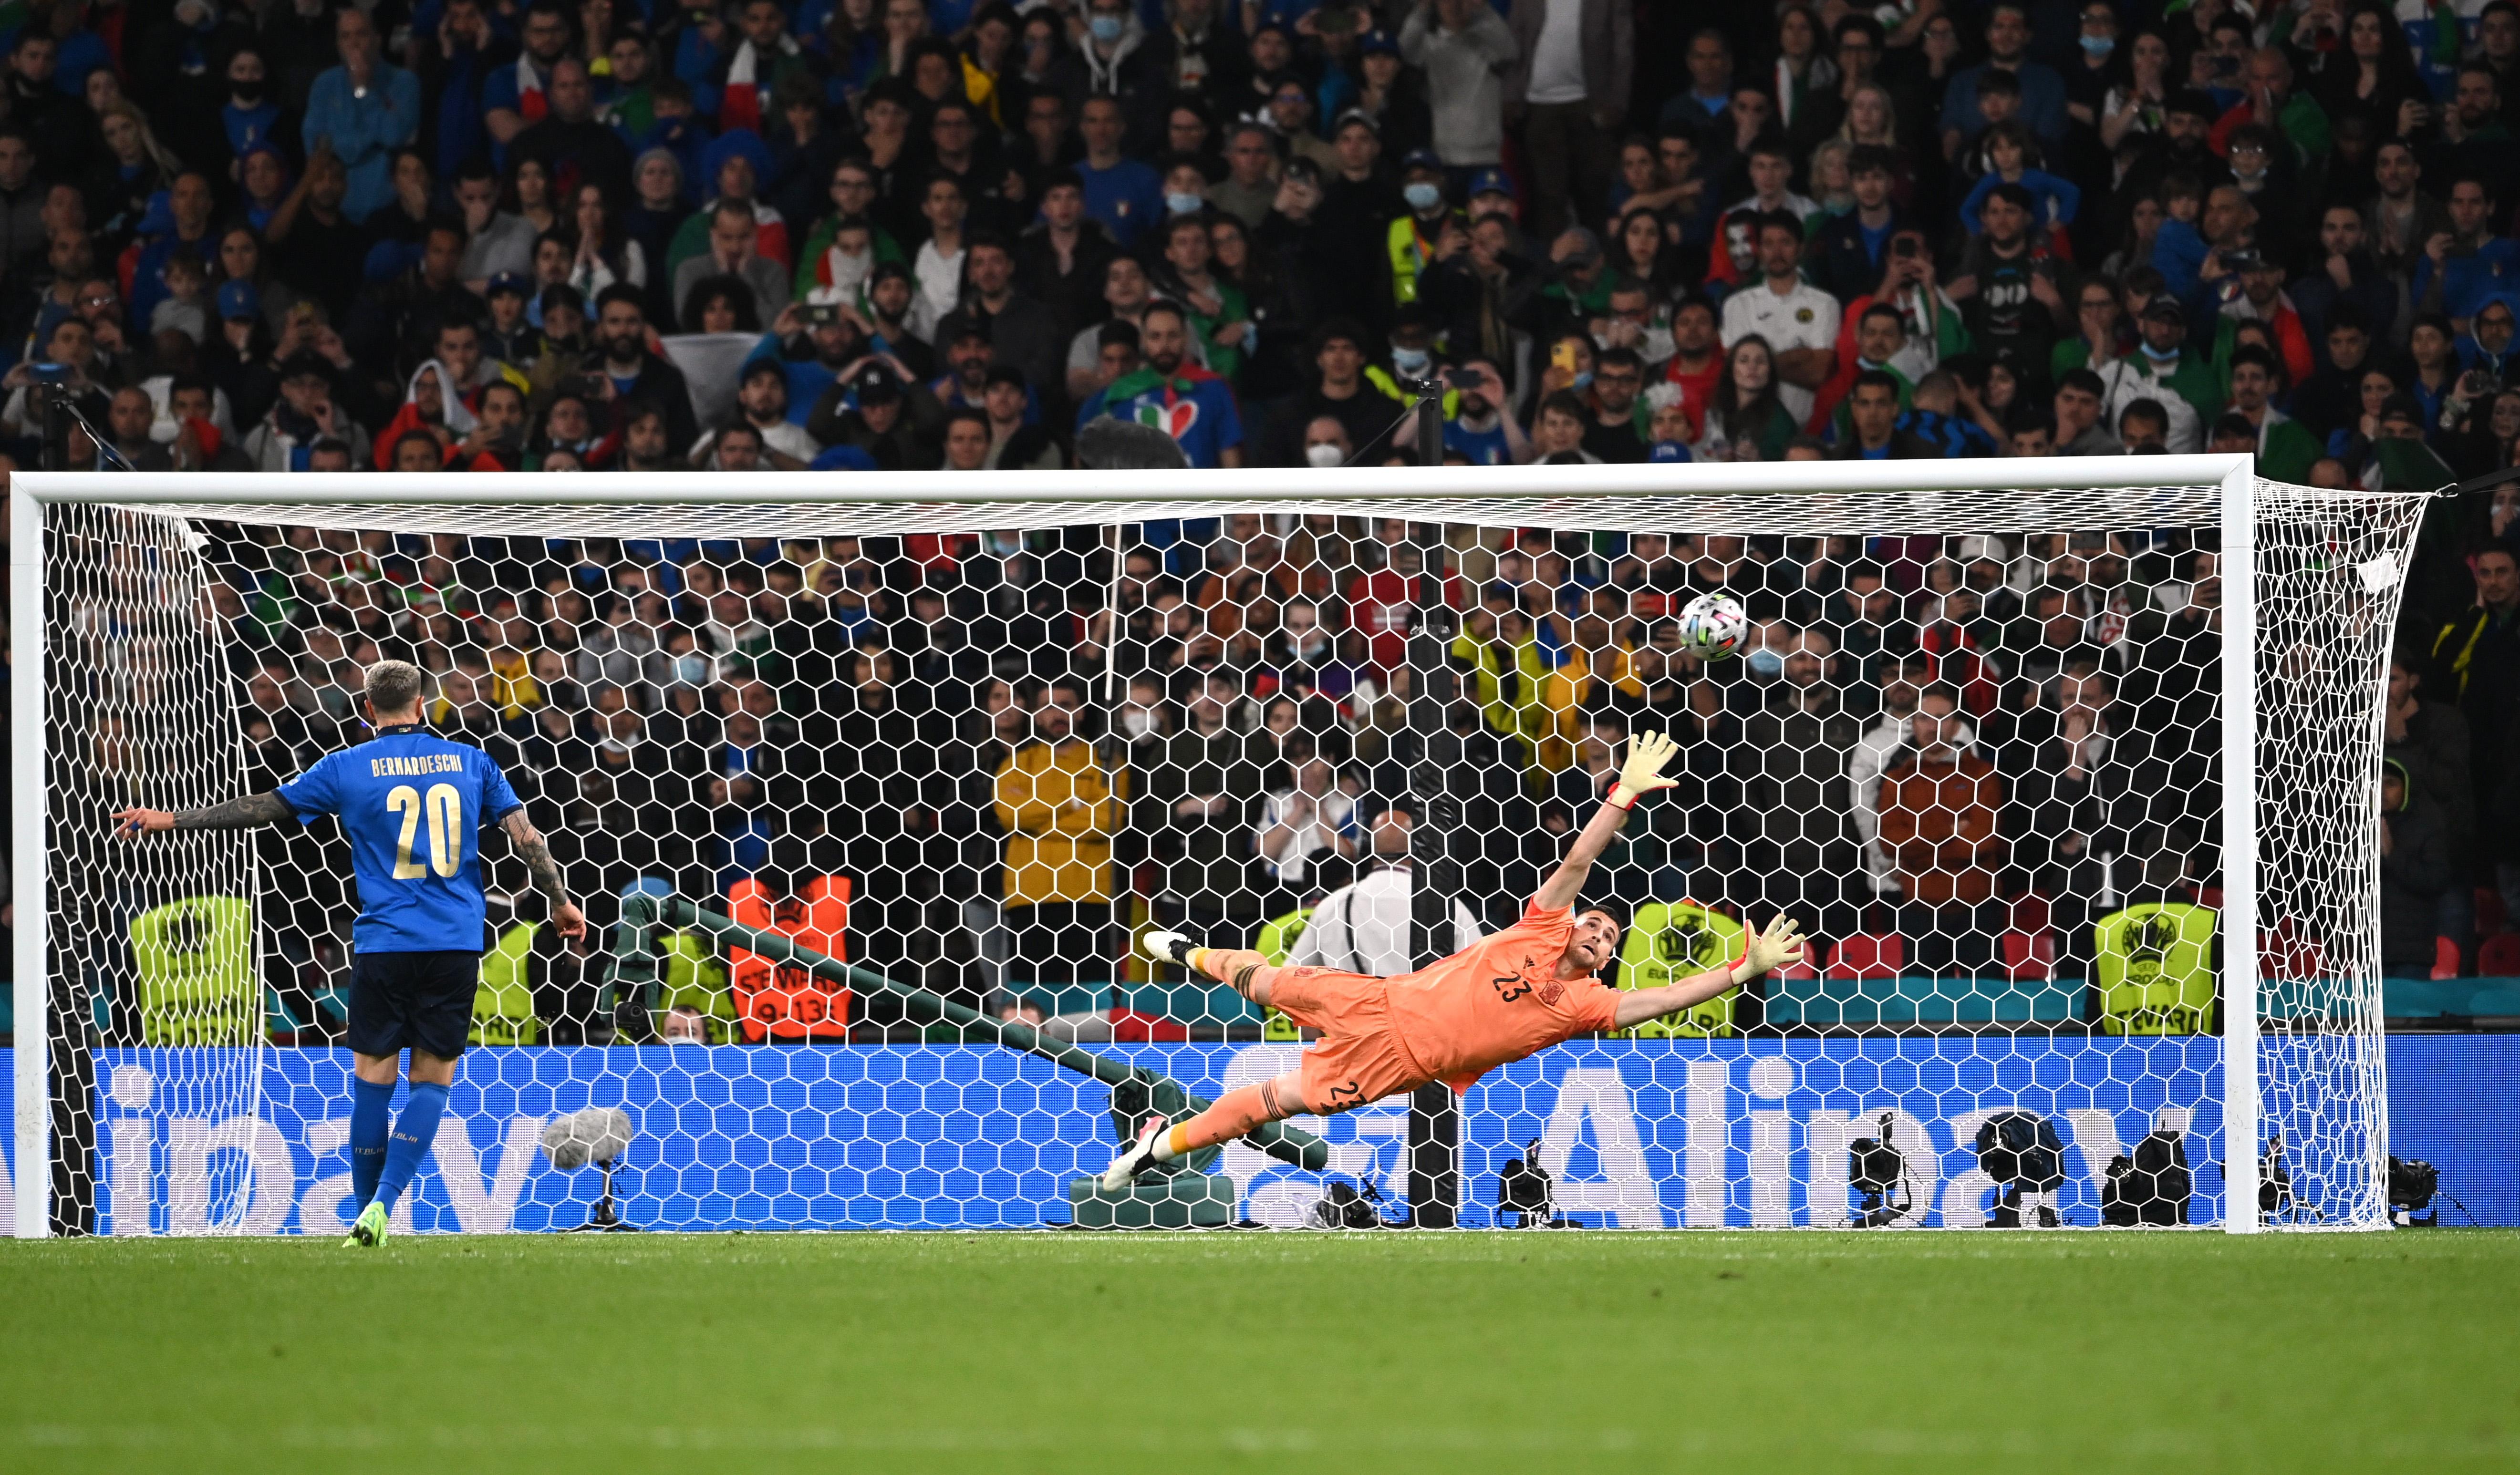 Soccer Football - Euro 2020 - Semi Final - Italy v Spain - Wembley Stadium, London, Britain - July 6, 2021 Italy's Federico Bernardeschi scores a penalty during the shootout Pool via REUTERS/Andy Rain